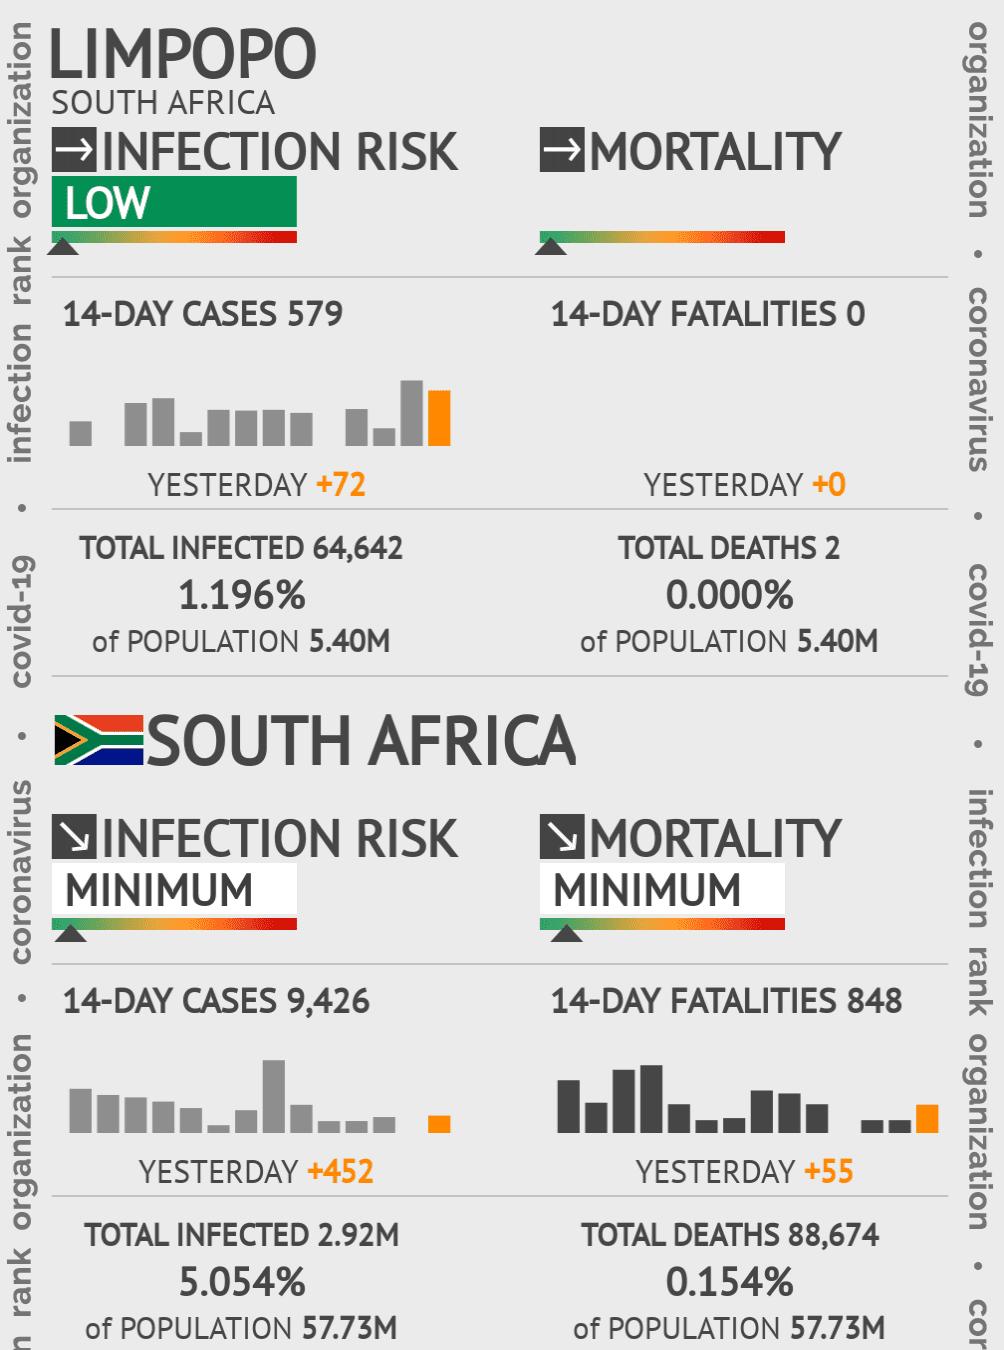 Limpopo Coronavirus Covid-19 Risk of Infection on February 23, 2021